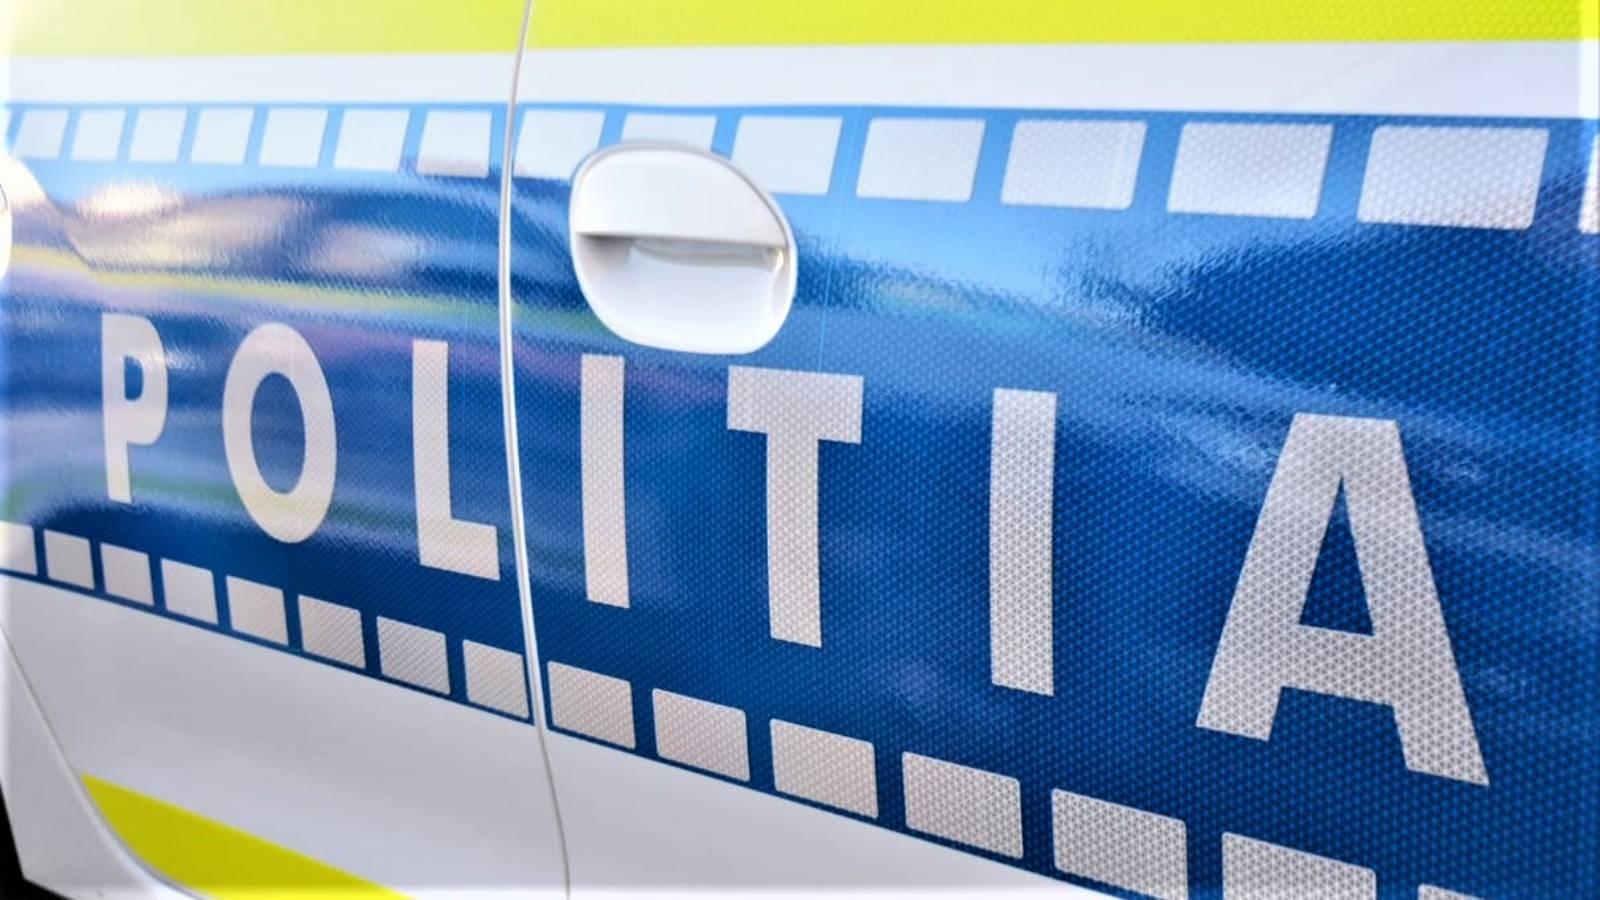 Politia Romana raspundere animale